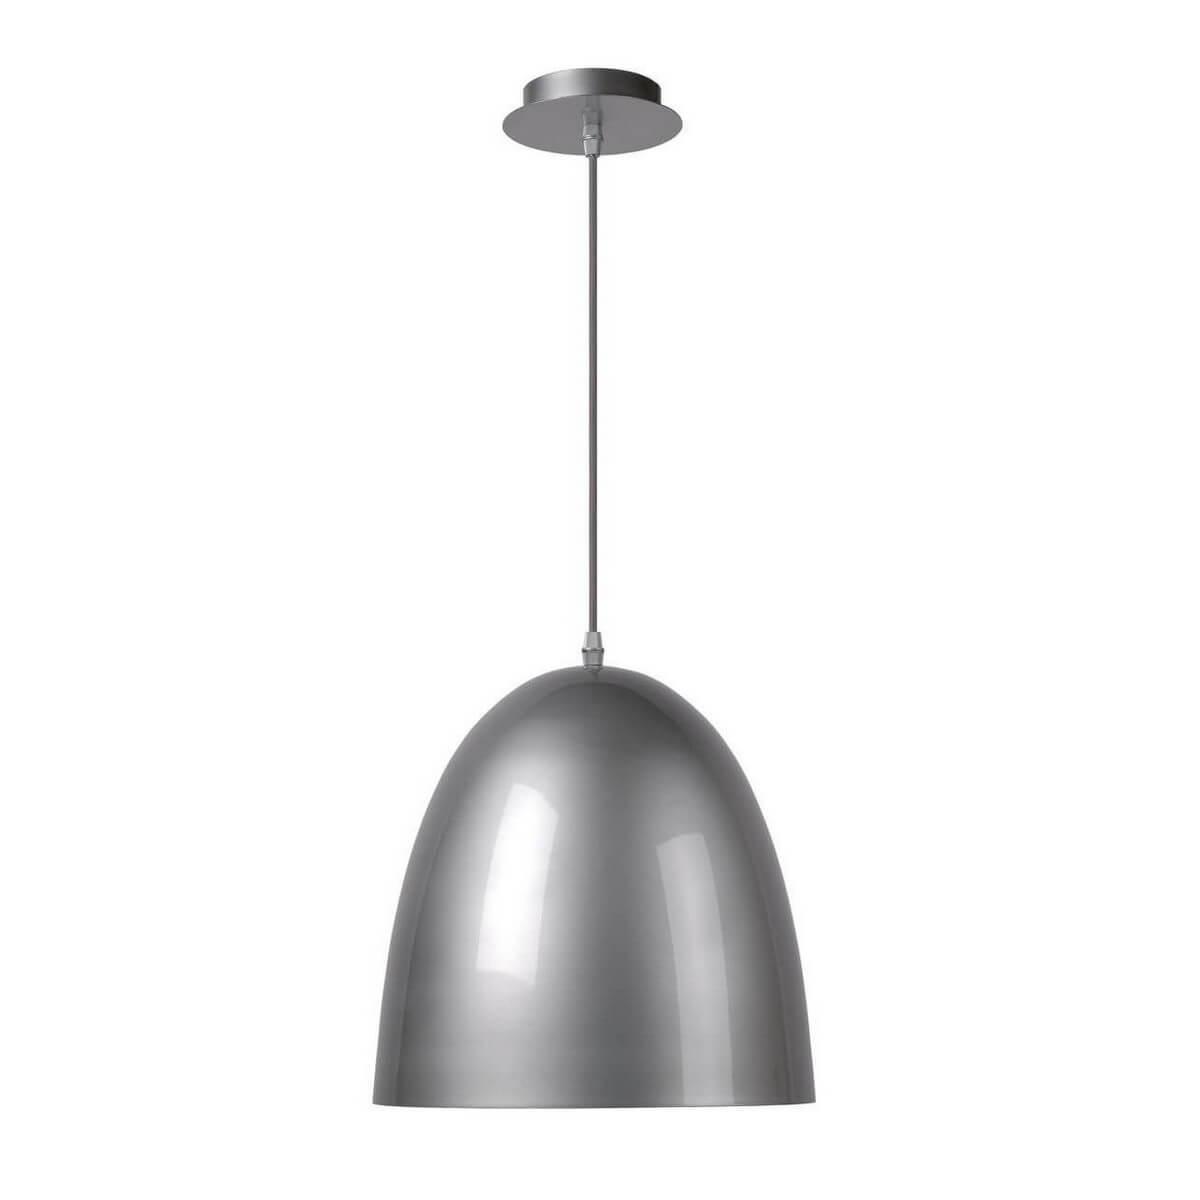 Подвесной светильник Lucide 76456/30/36, E27, 60 Вт lucide подвесной светильник lucide tonga 79459 25 30